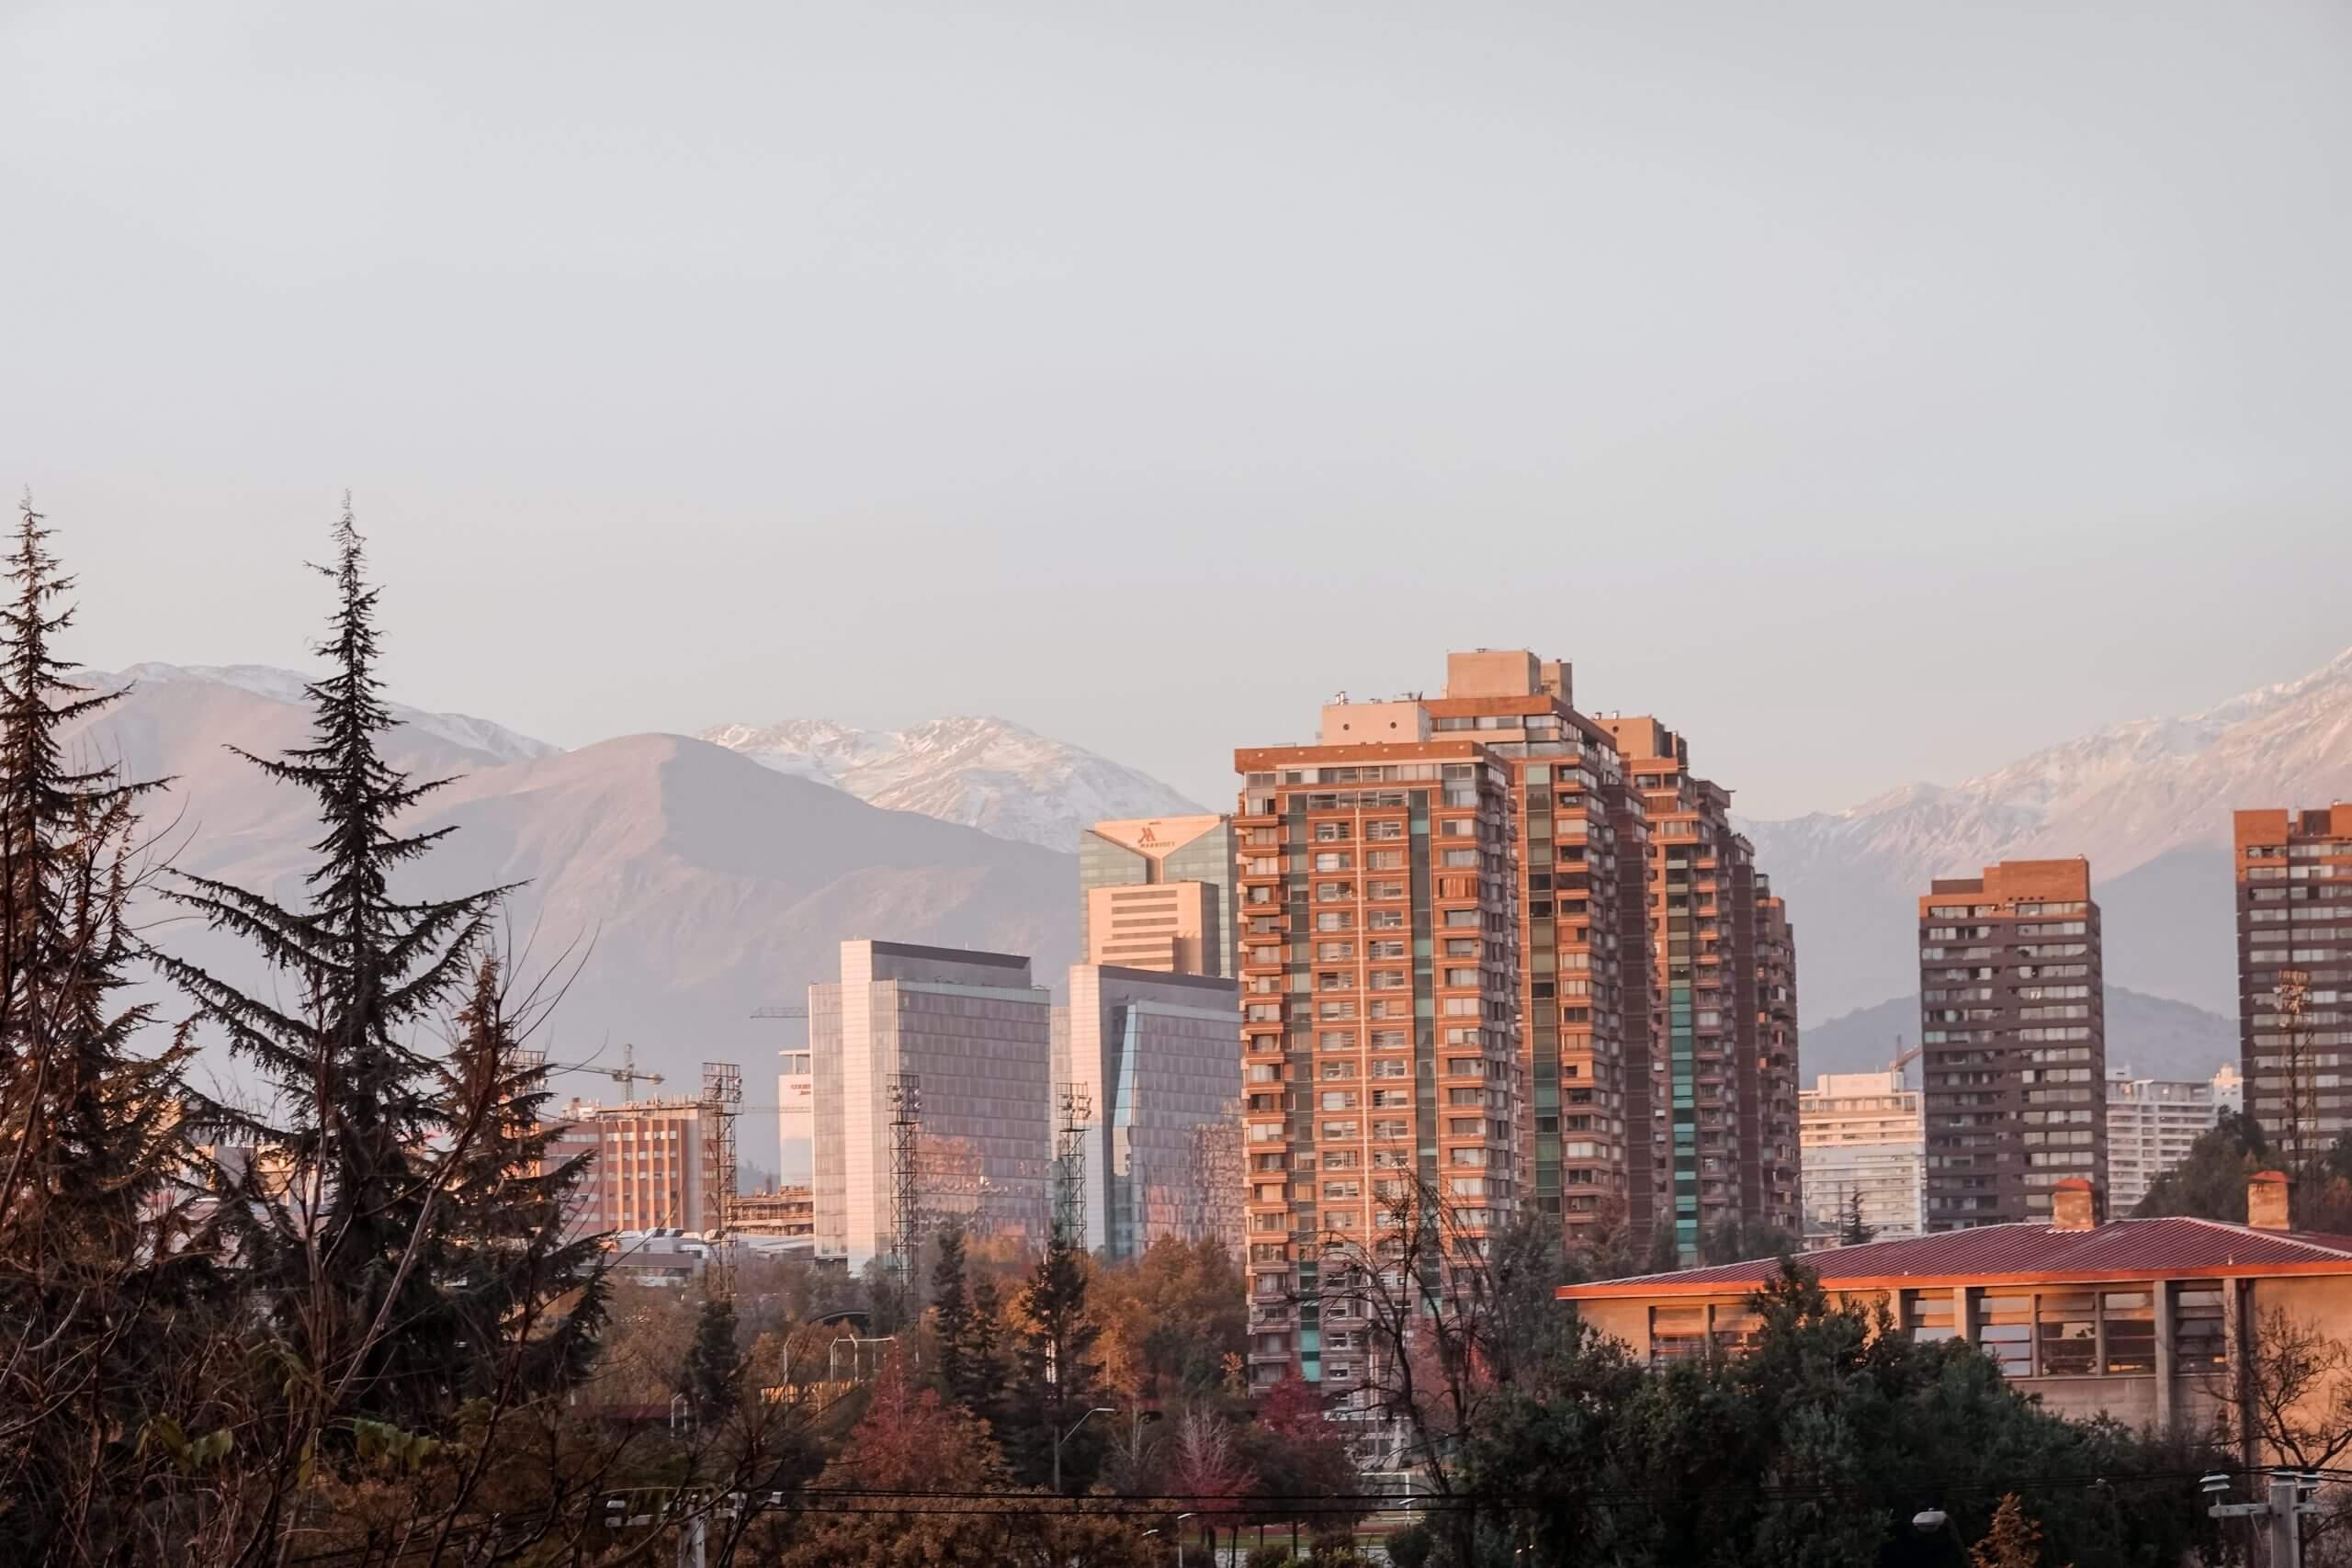 Santiago June 2020